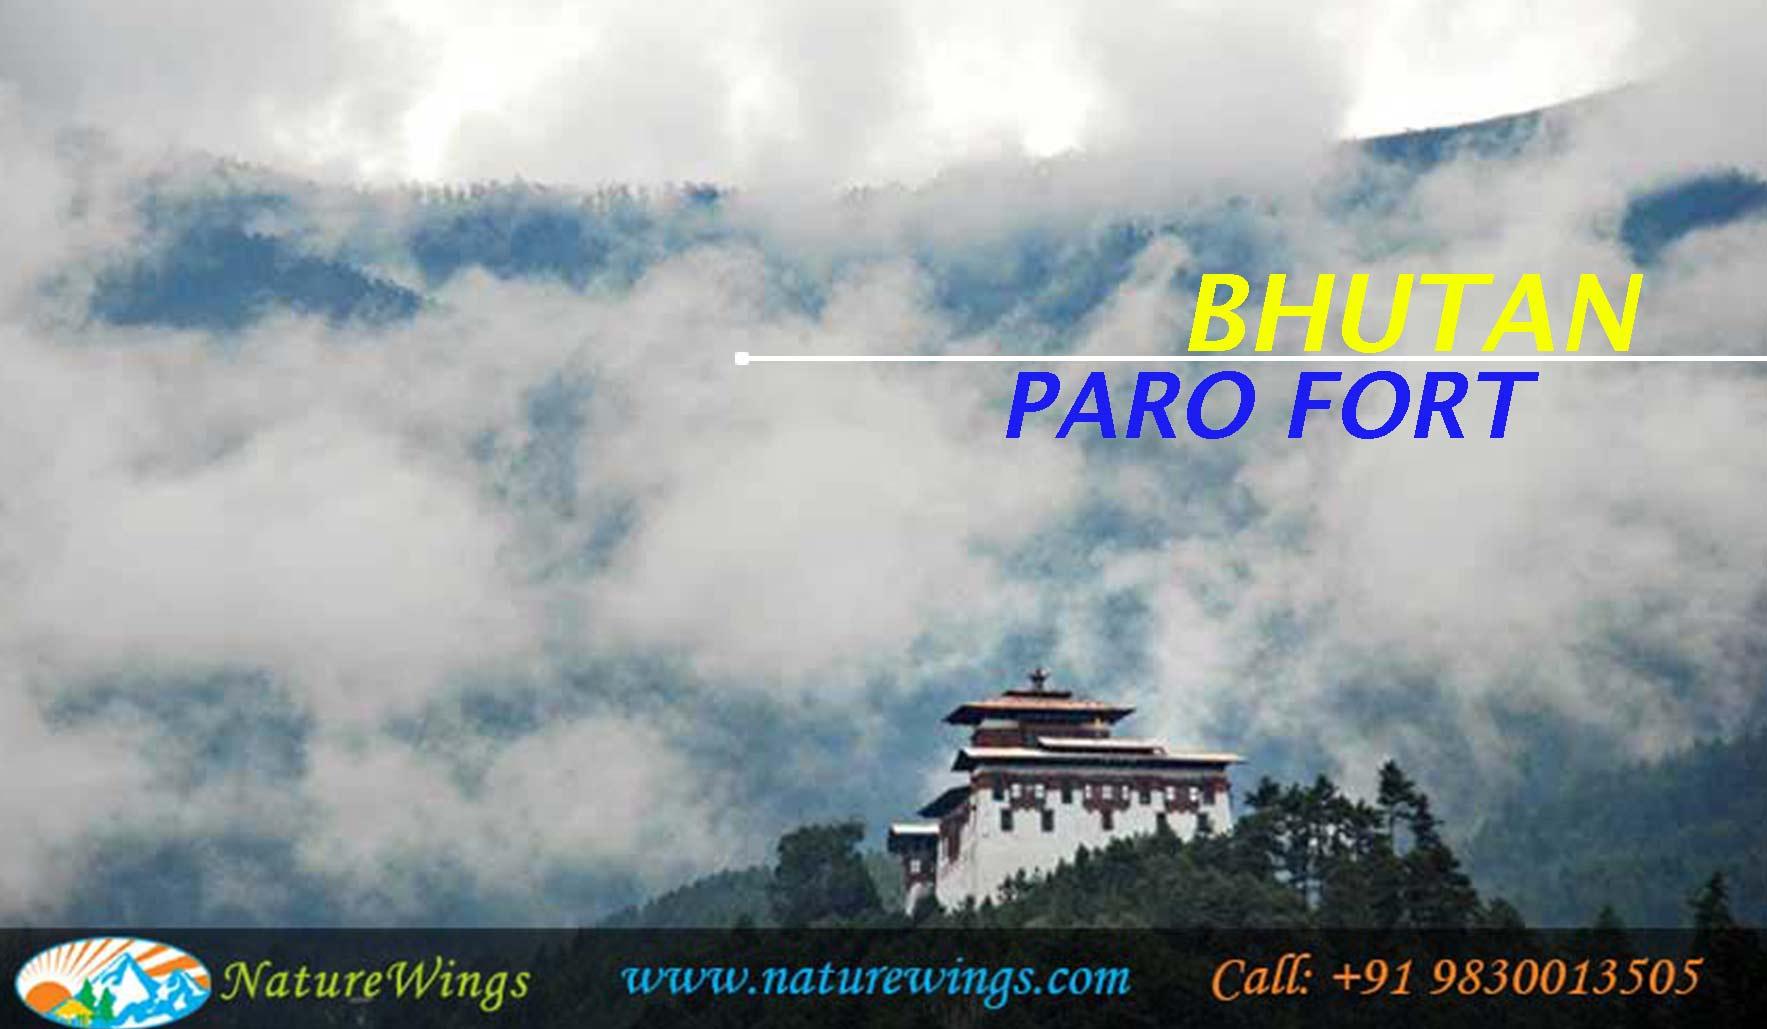 Visit Paro fort during Bhutan Package from Mumbai